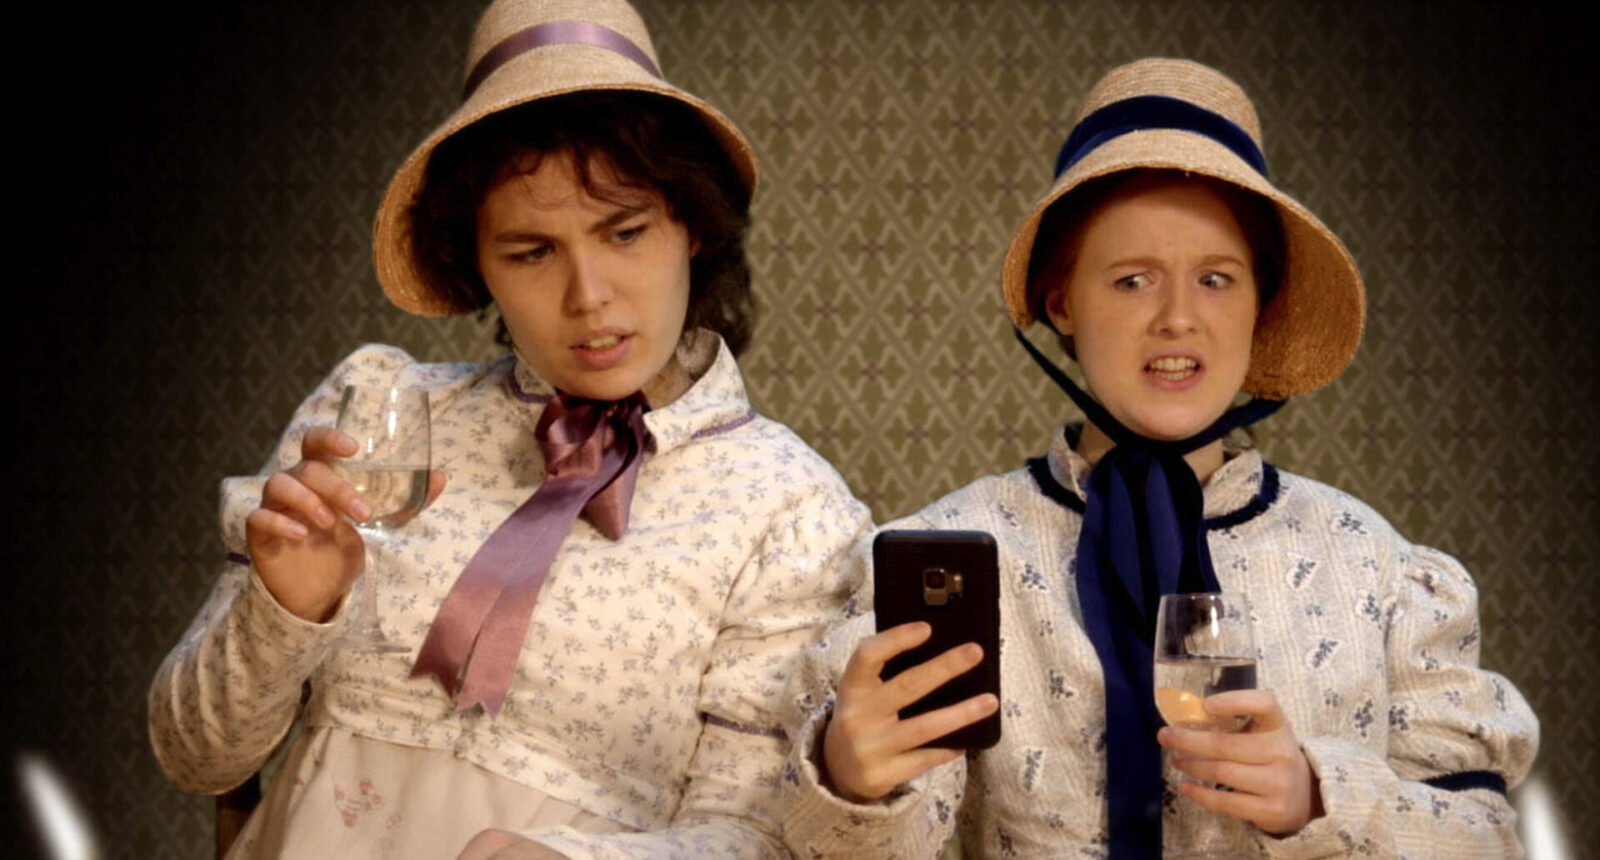 two girls in Regency dress look at a mobile phone in shock